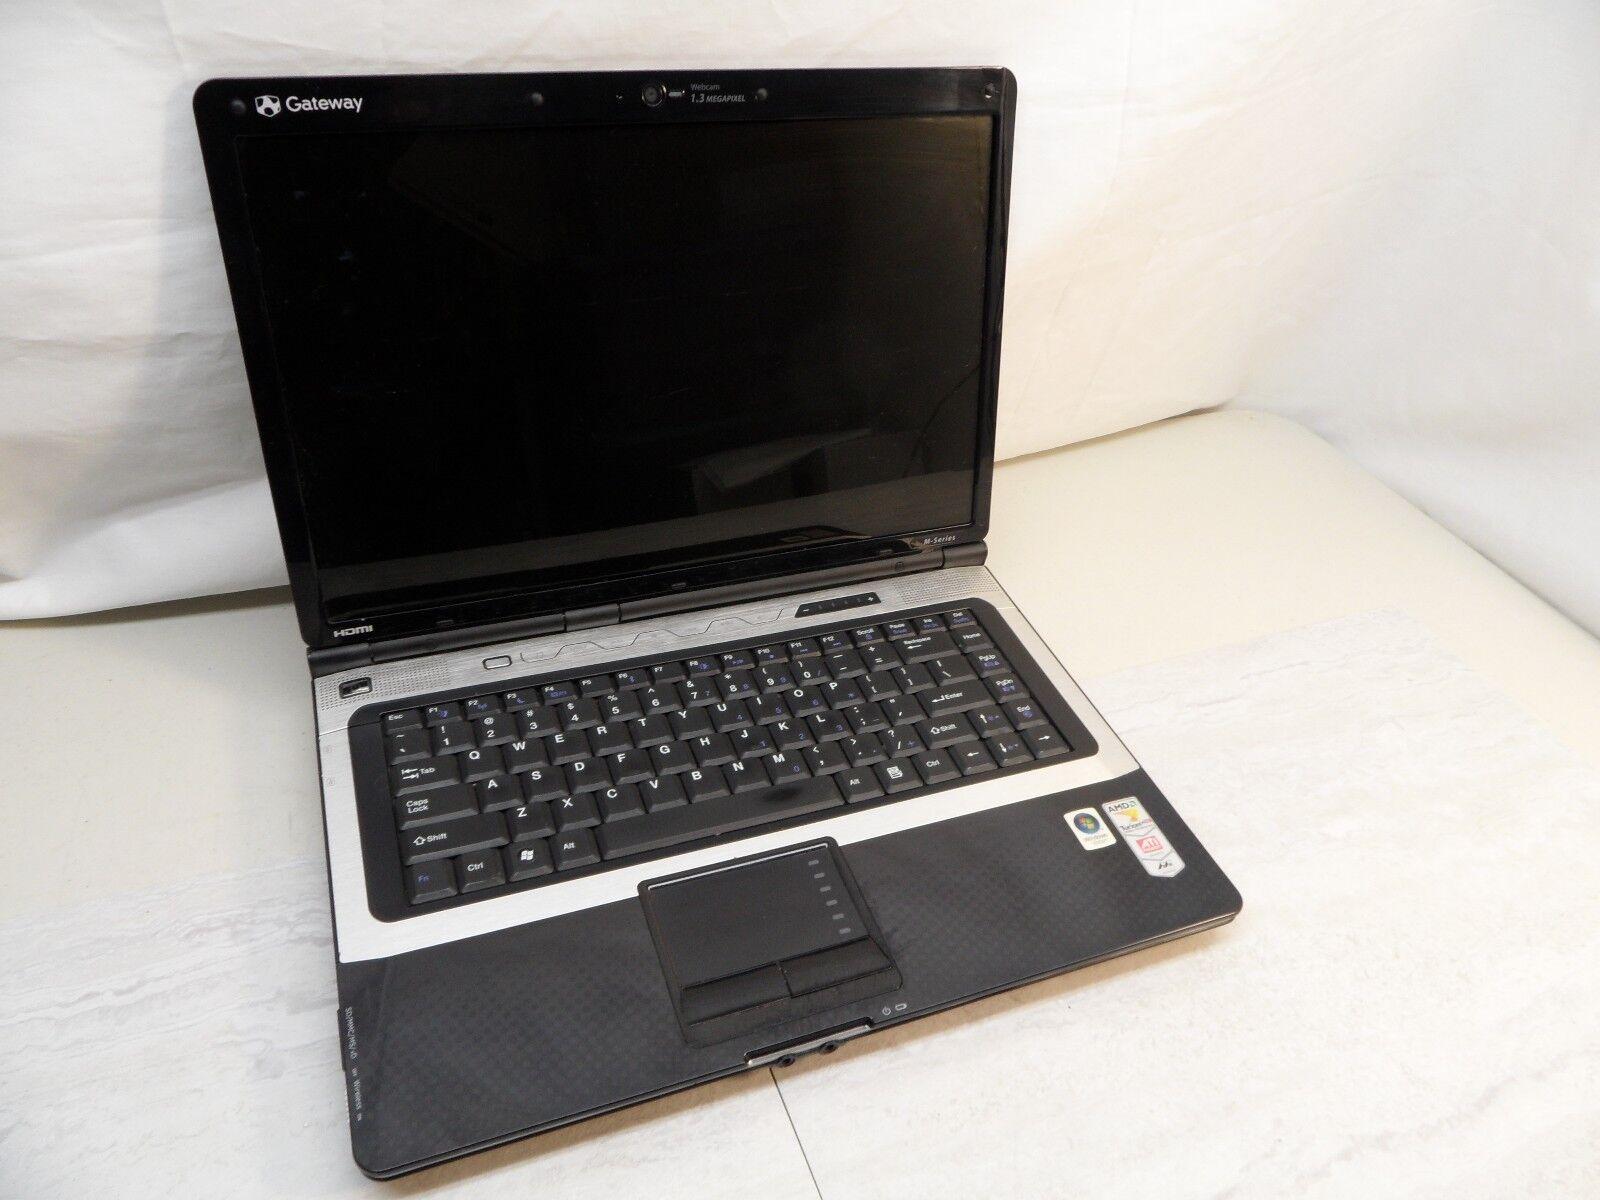 Gateway M-Series  W650A Parts Laptop 1.9Ghz 1.5Ghz No Hard Drive Posted To Bios